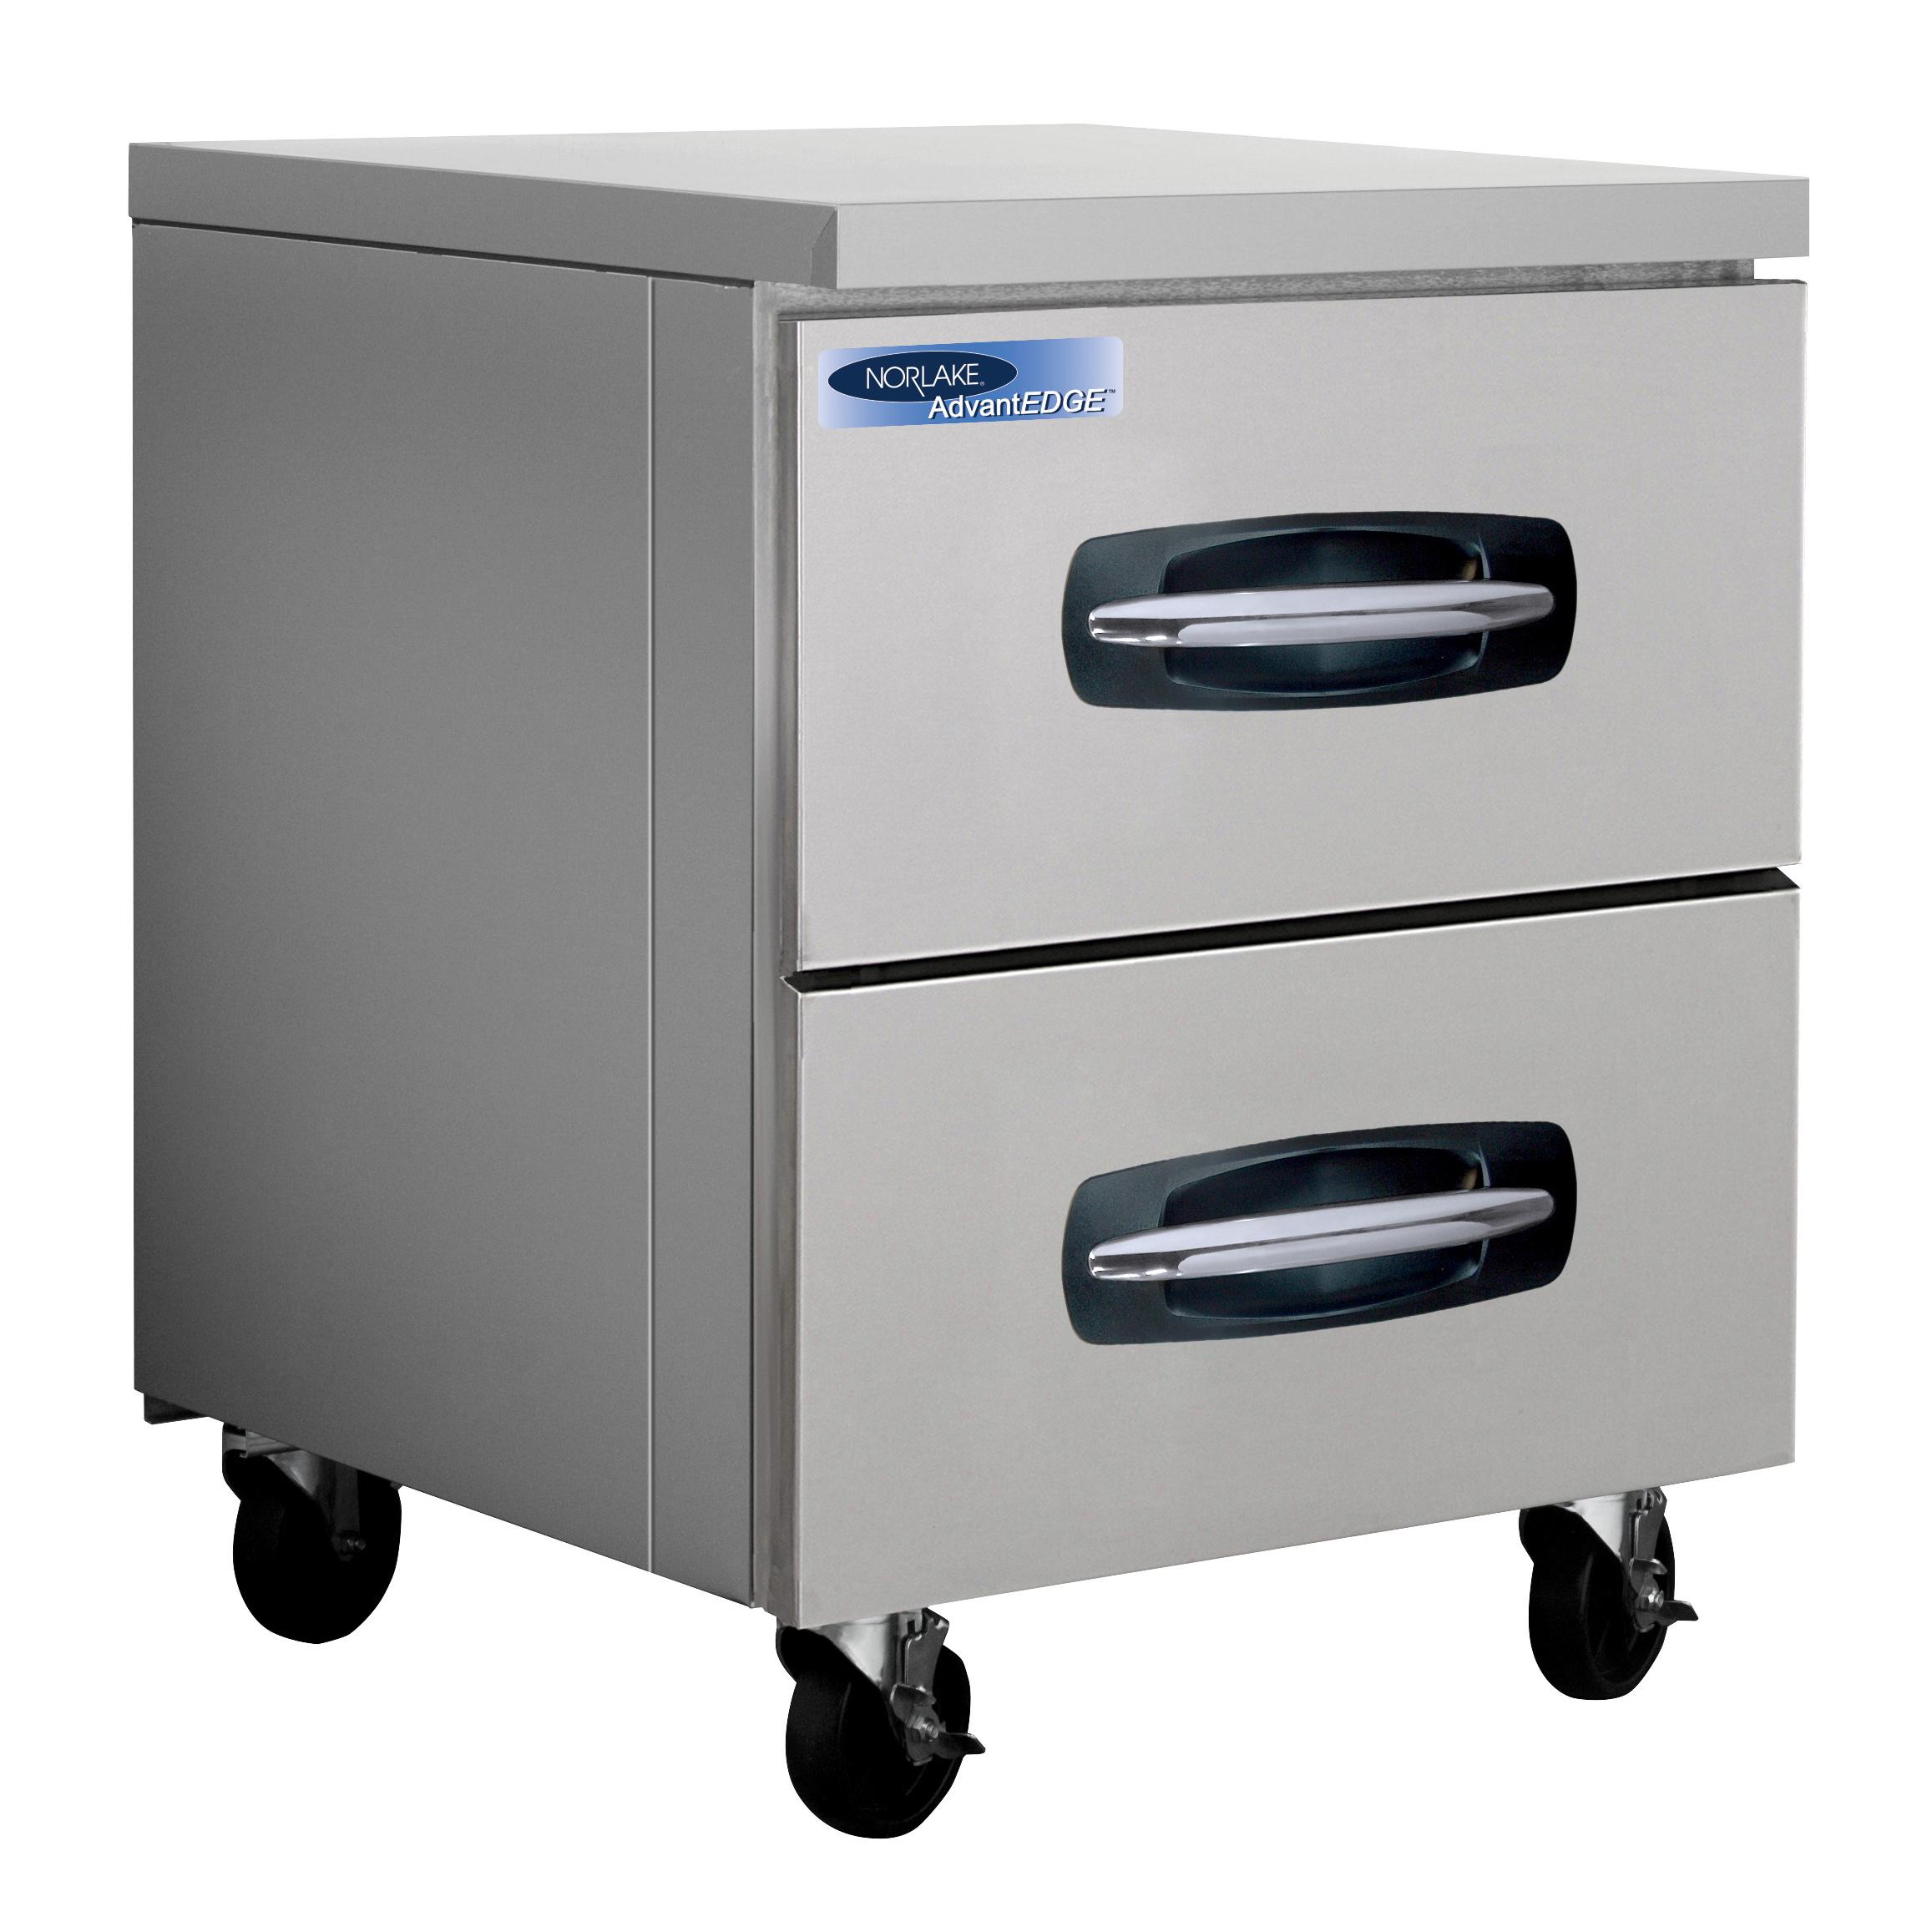 Nor-Lake NLUR27A-001B refrigerator, undercounter, reach-in